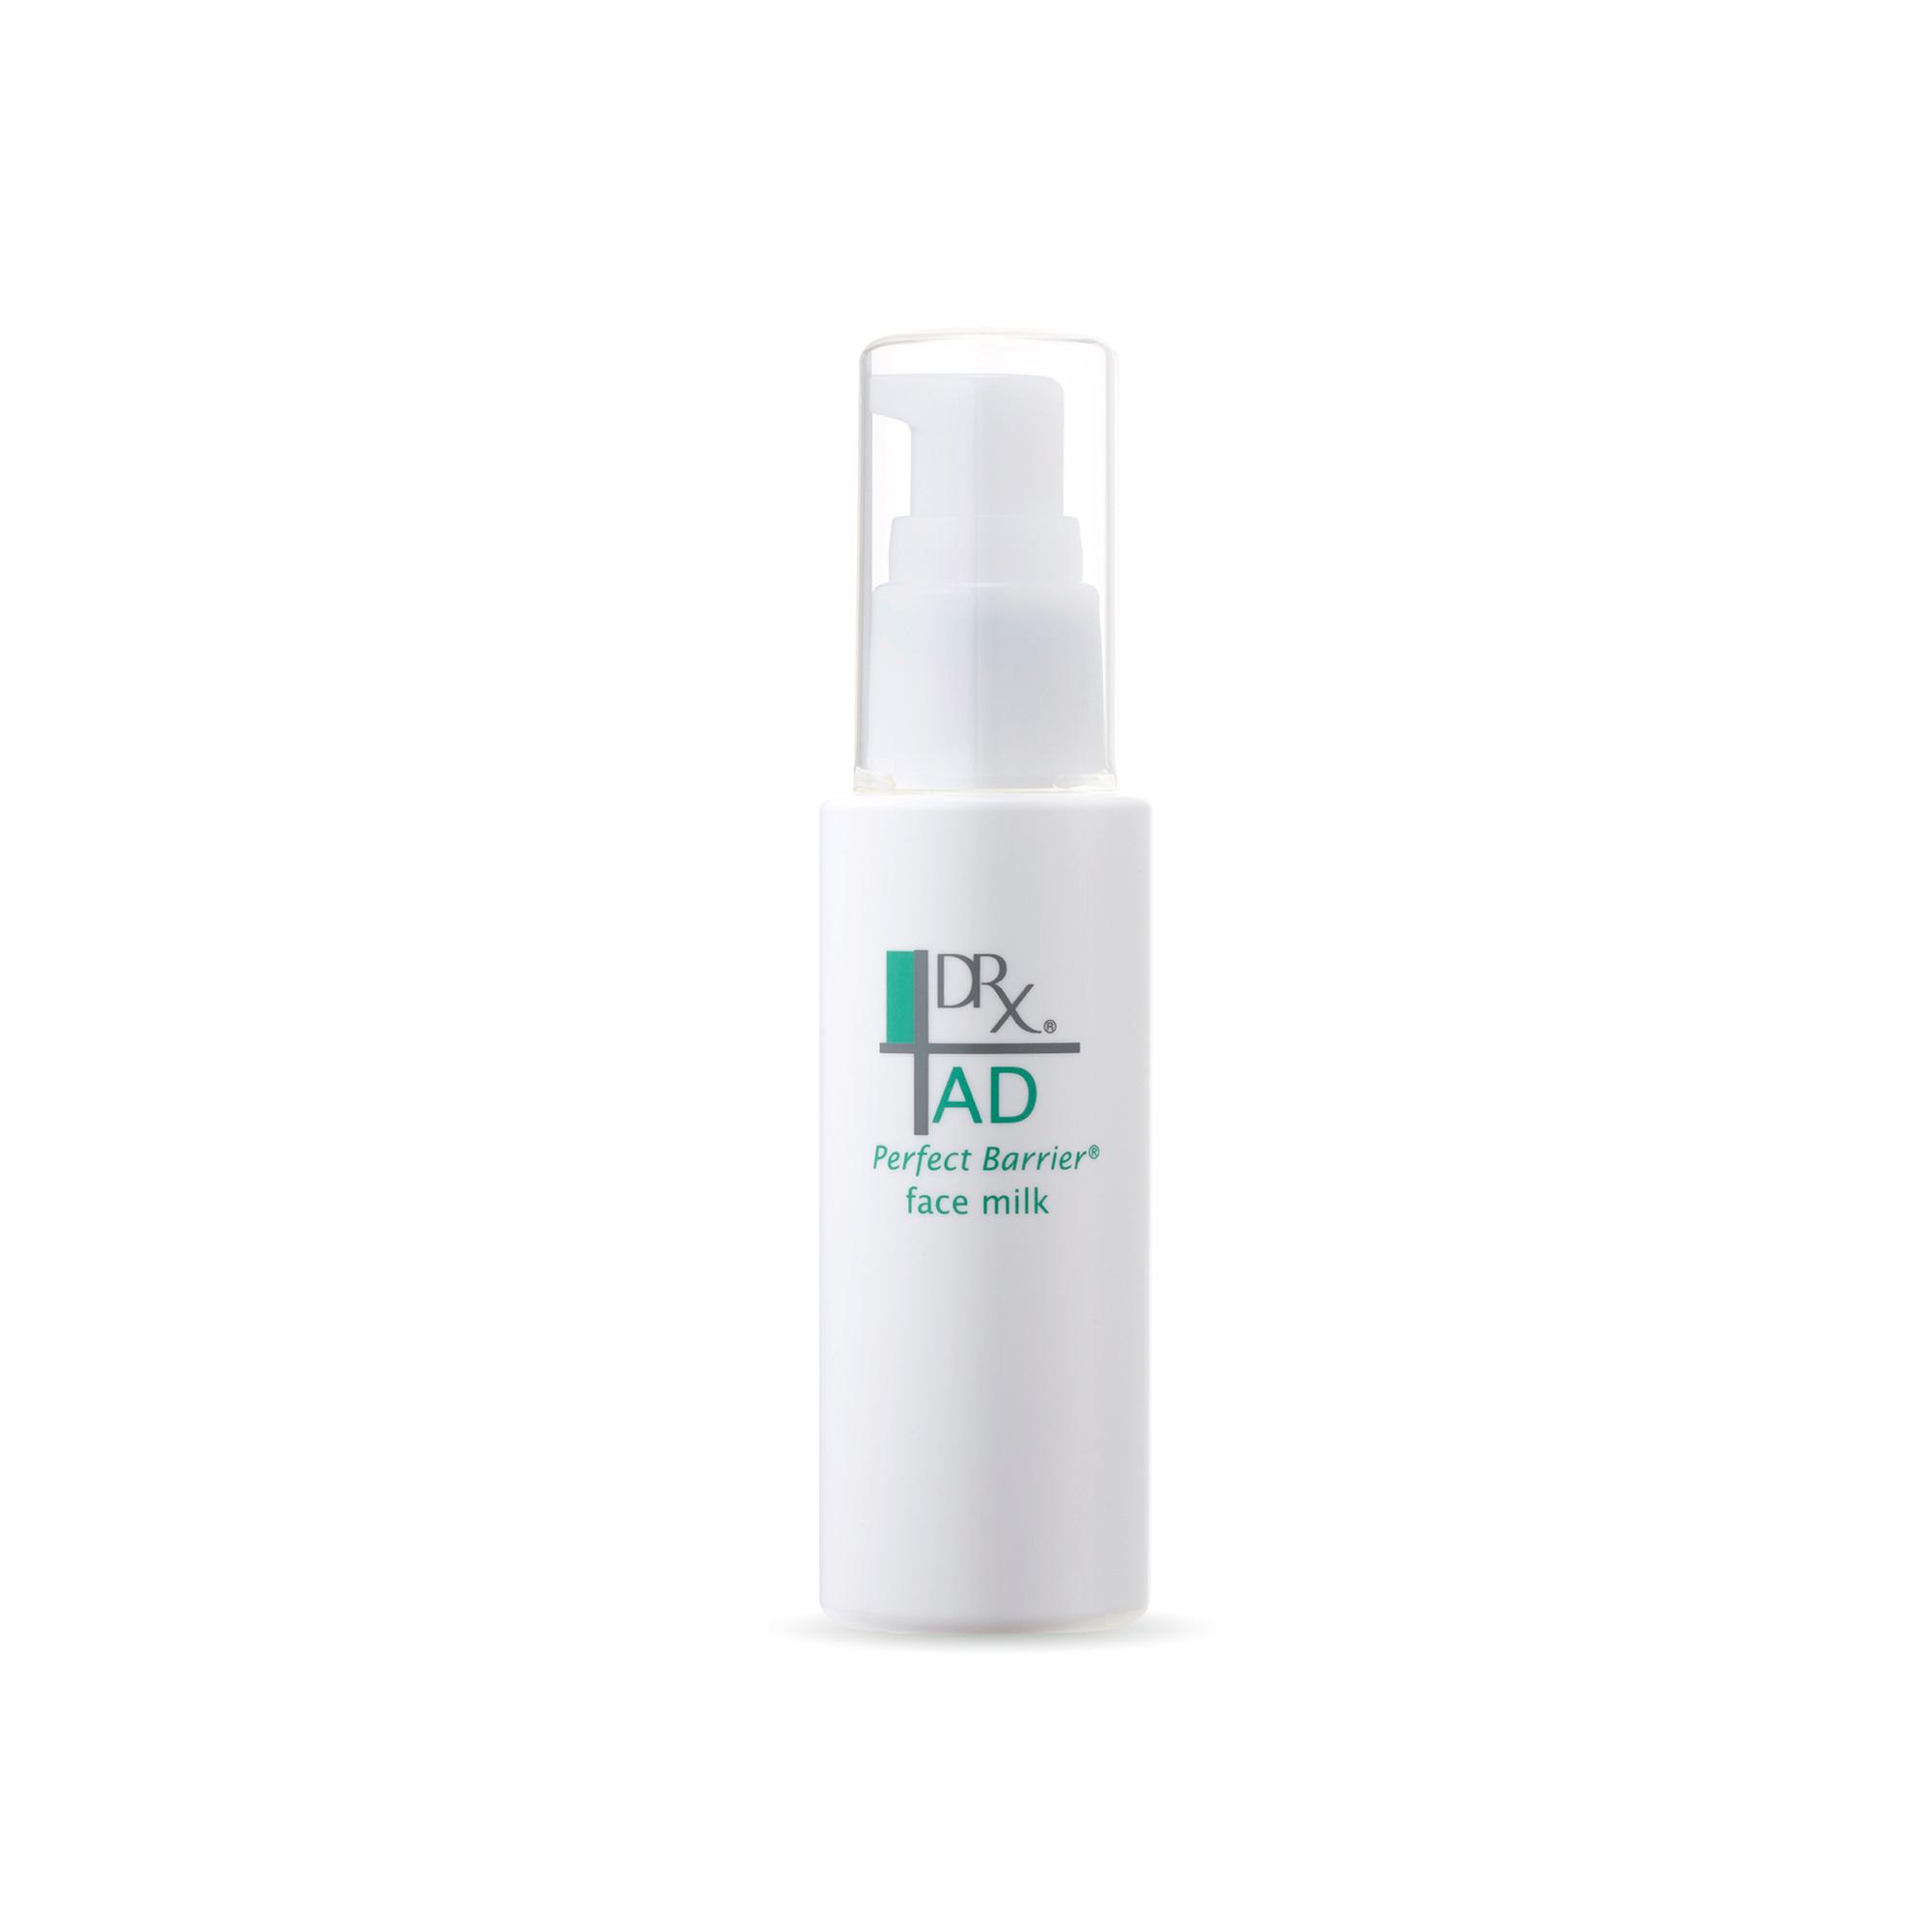 Dưỡng ẩm face dạng sữa DRX AD Perfect Barrier Face Milk - Rohto Mentholatum